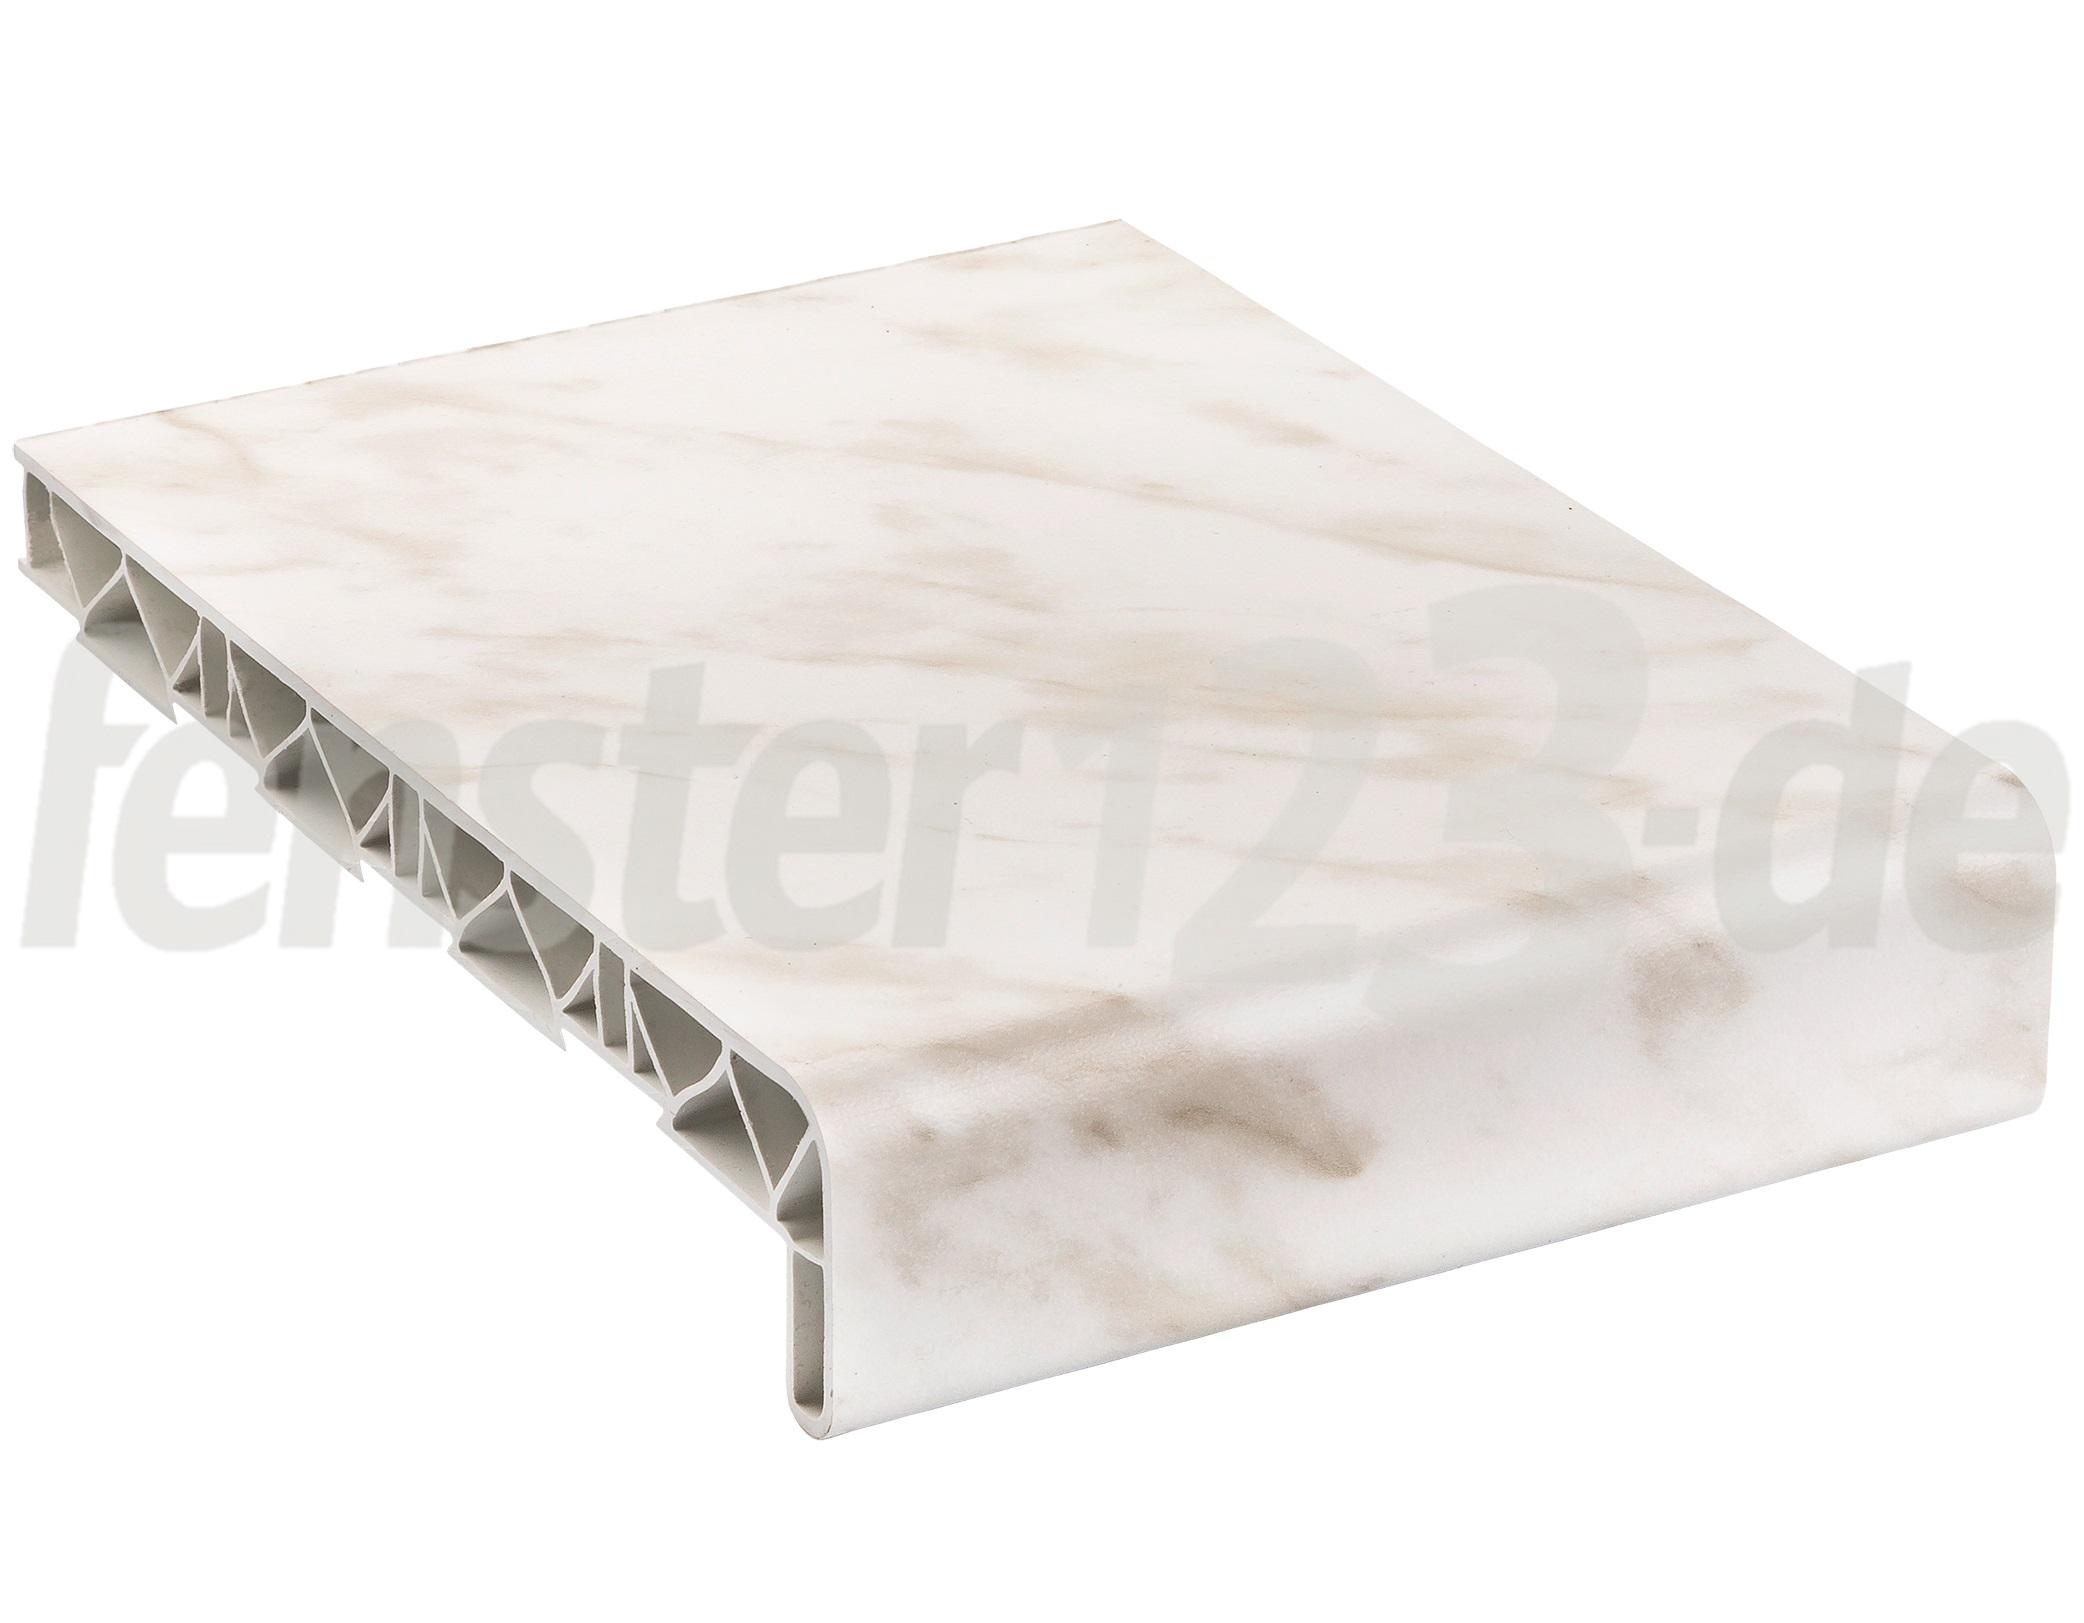 erfreut fensterb nke aus marmor galerie die. Black Bedroom Furniture Sets. Home Design Ideas